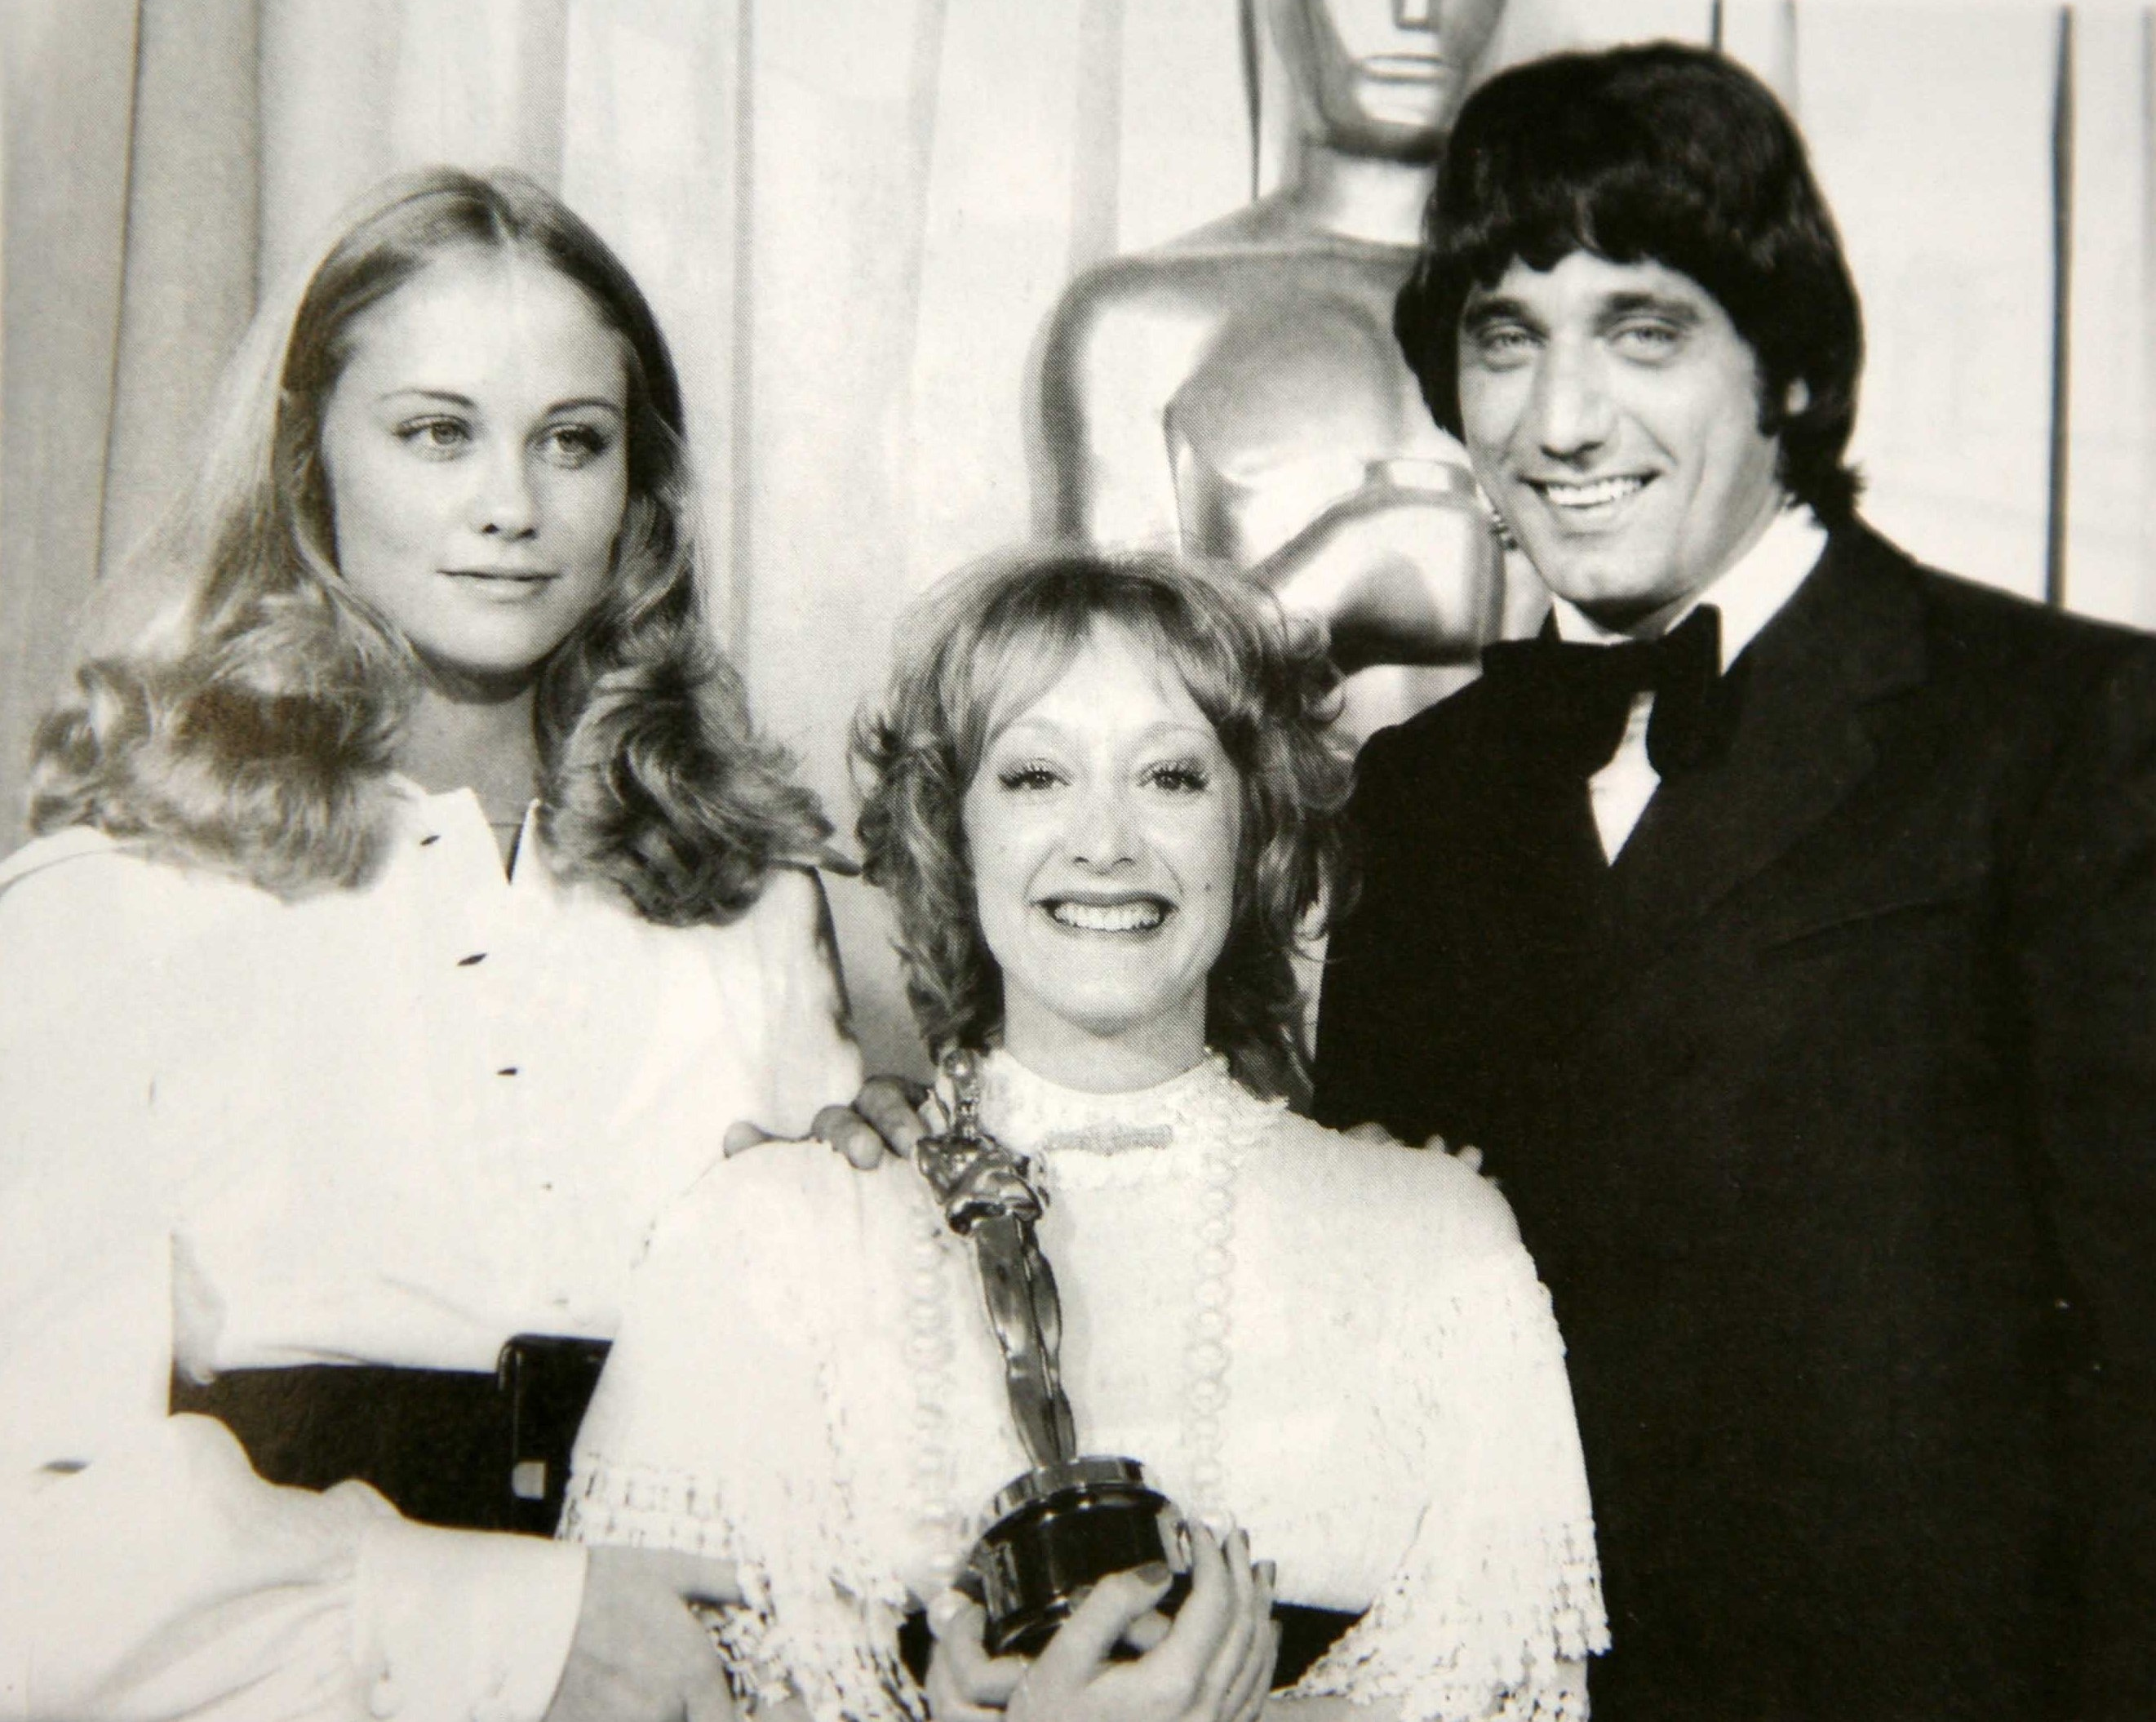 Cybill Shepherd, Yvonne Blake, and Joe Namath at an event for 44th Annual Academy Awards (1972)